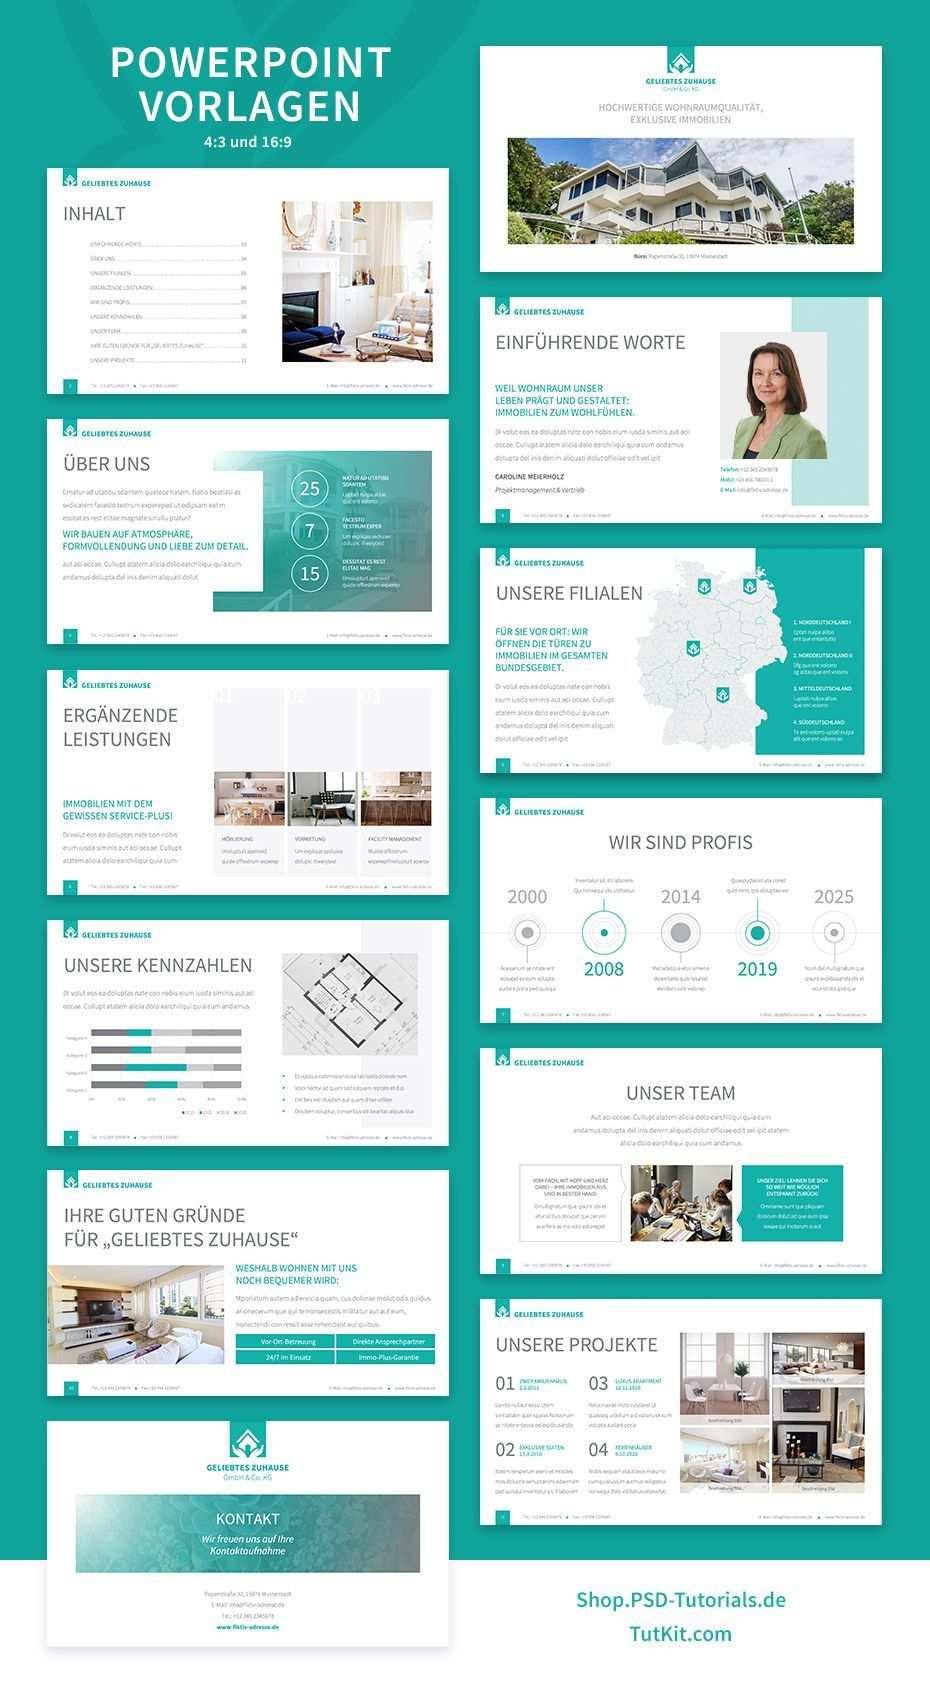 Elegantes Corporate Design Fur Den Bereich Immobilien Corporate Design Modern Powerpoint Design Powerpoint Design Templates